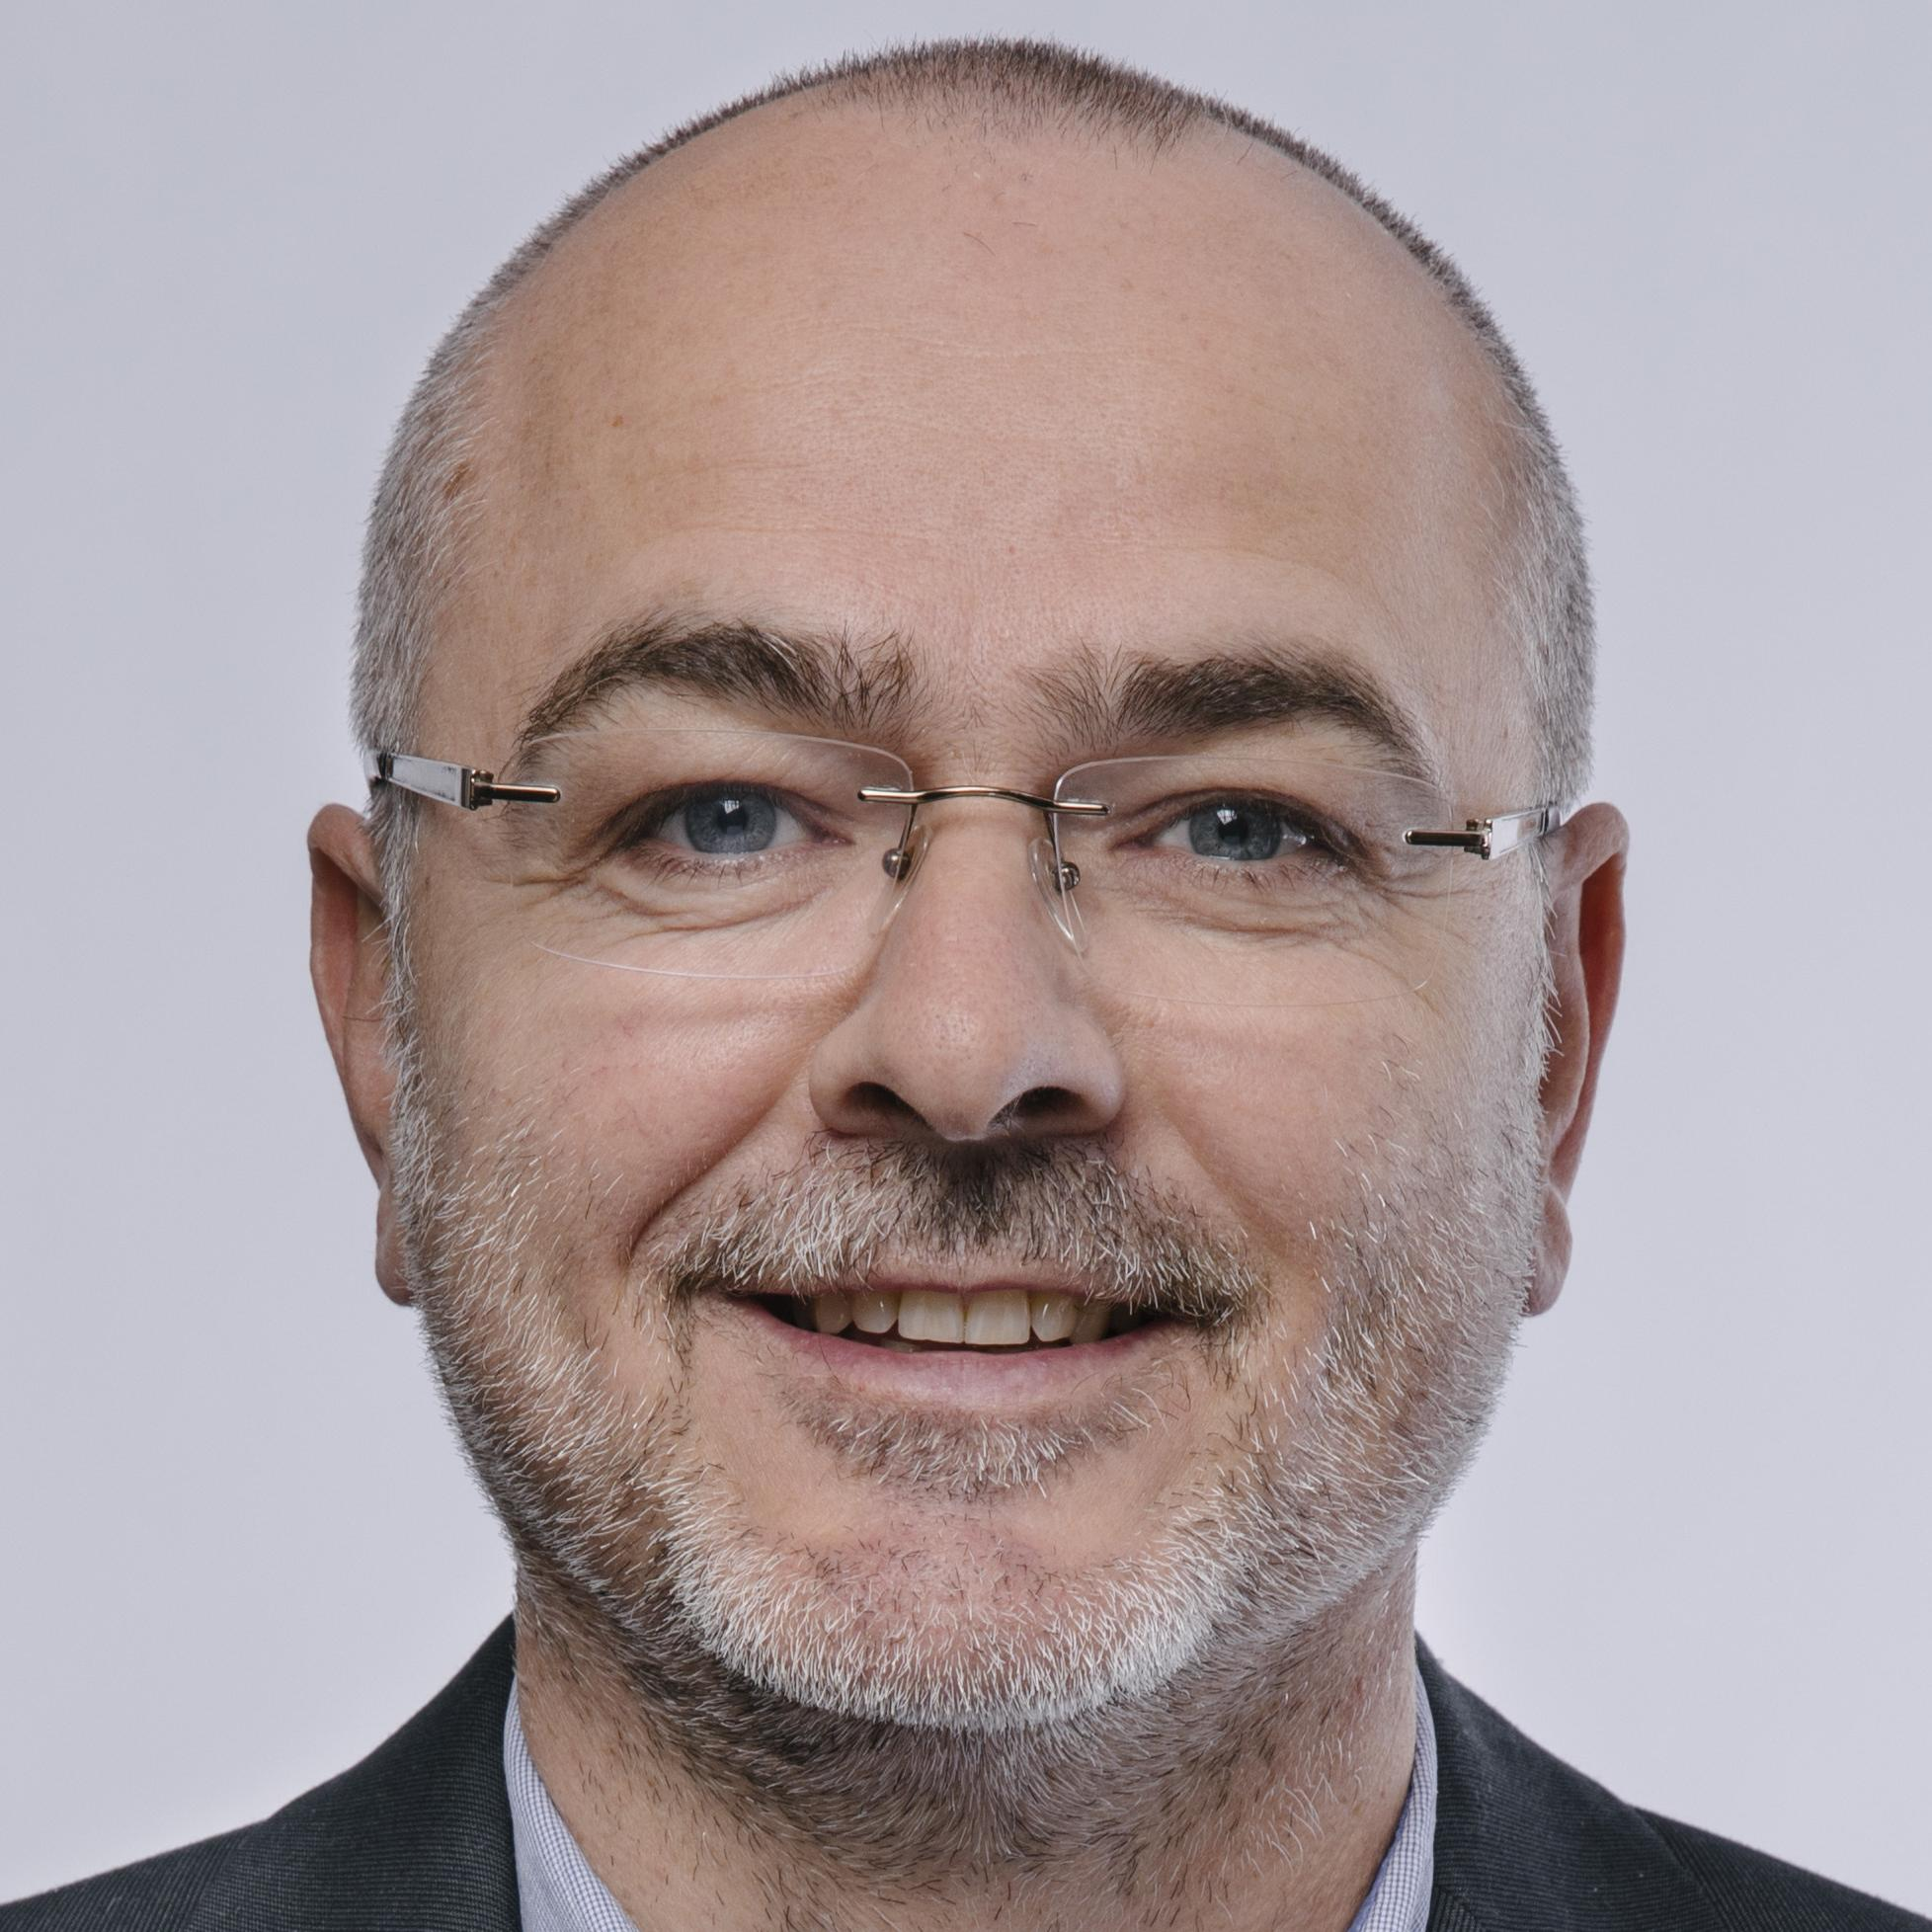 Martin Gruber